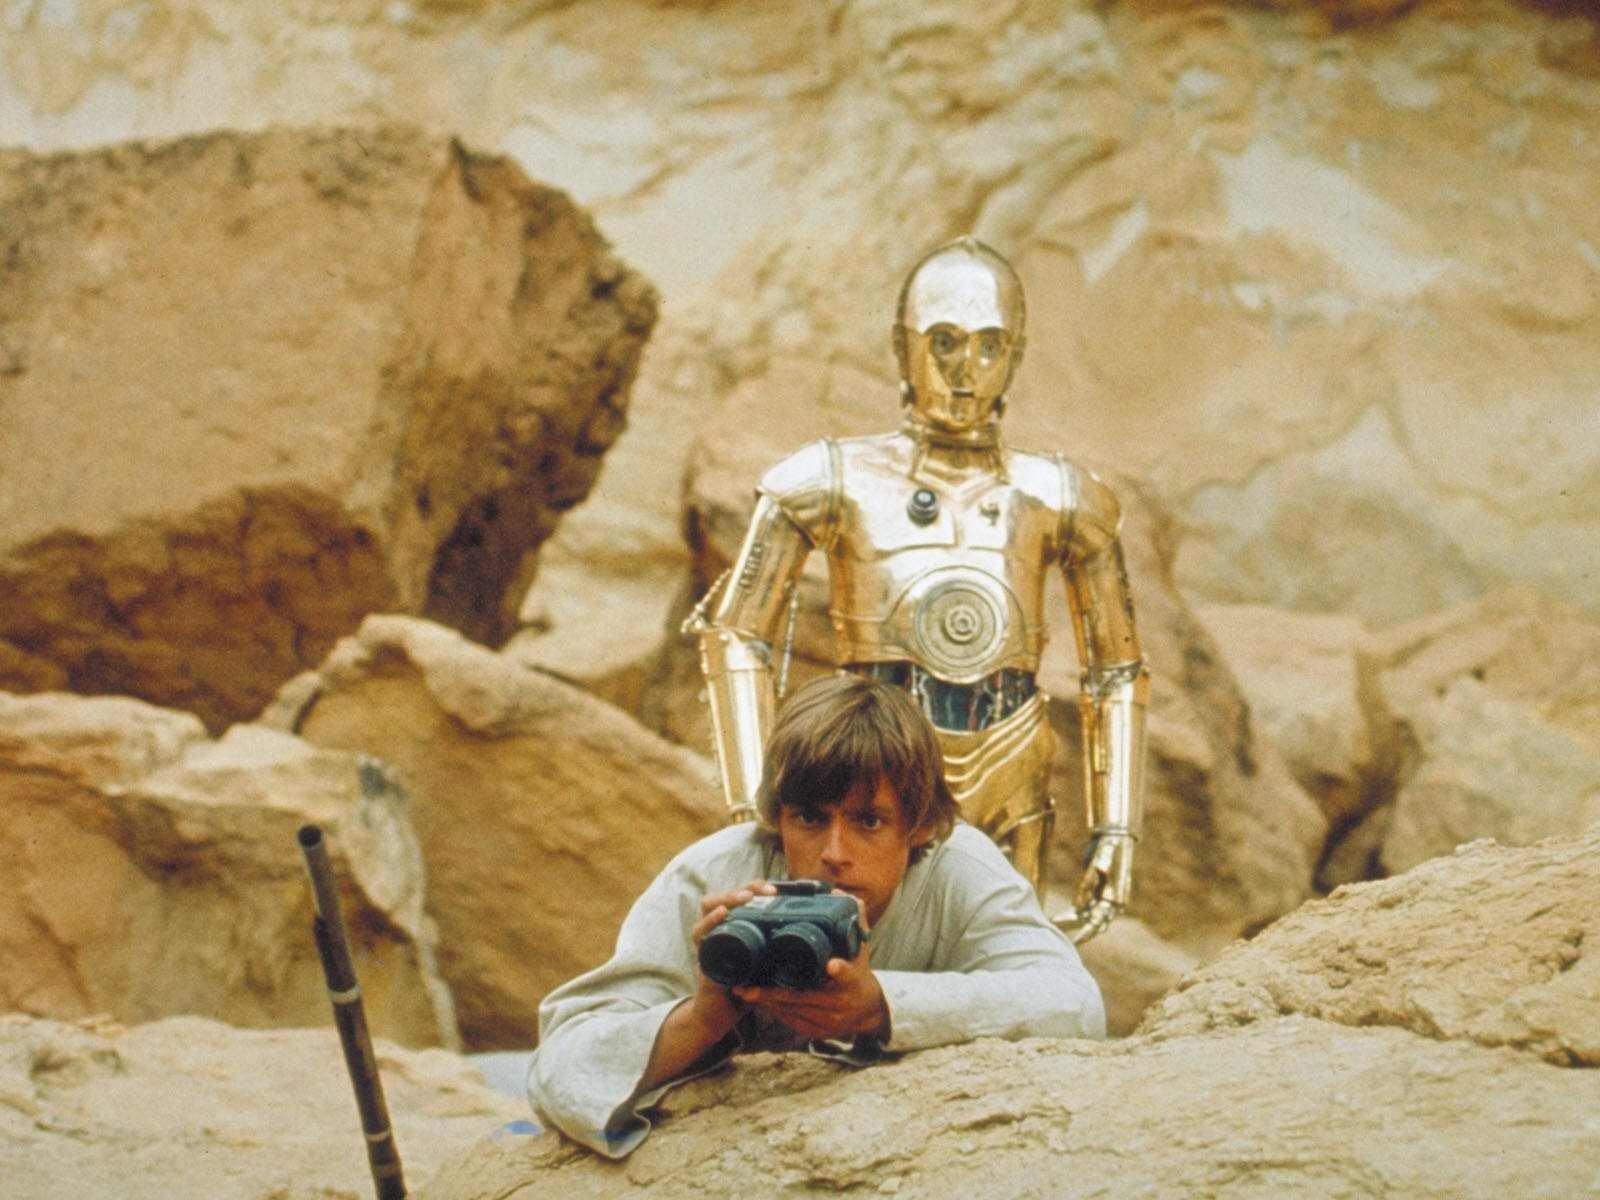 Movie - Star Wars Episode IV: A New Hope  C-3PO Luke Skywalker Wallpaper